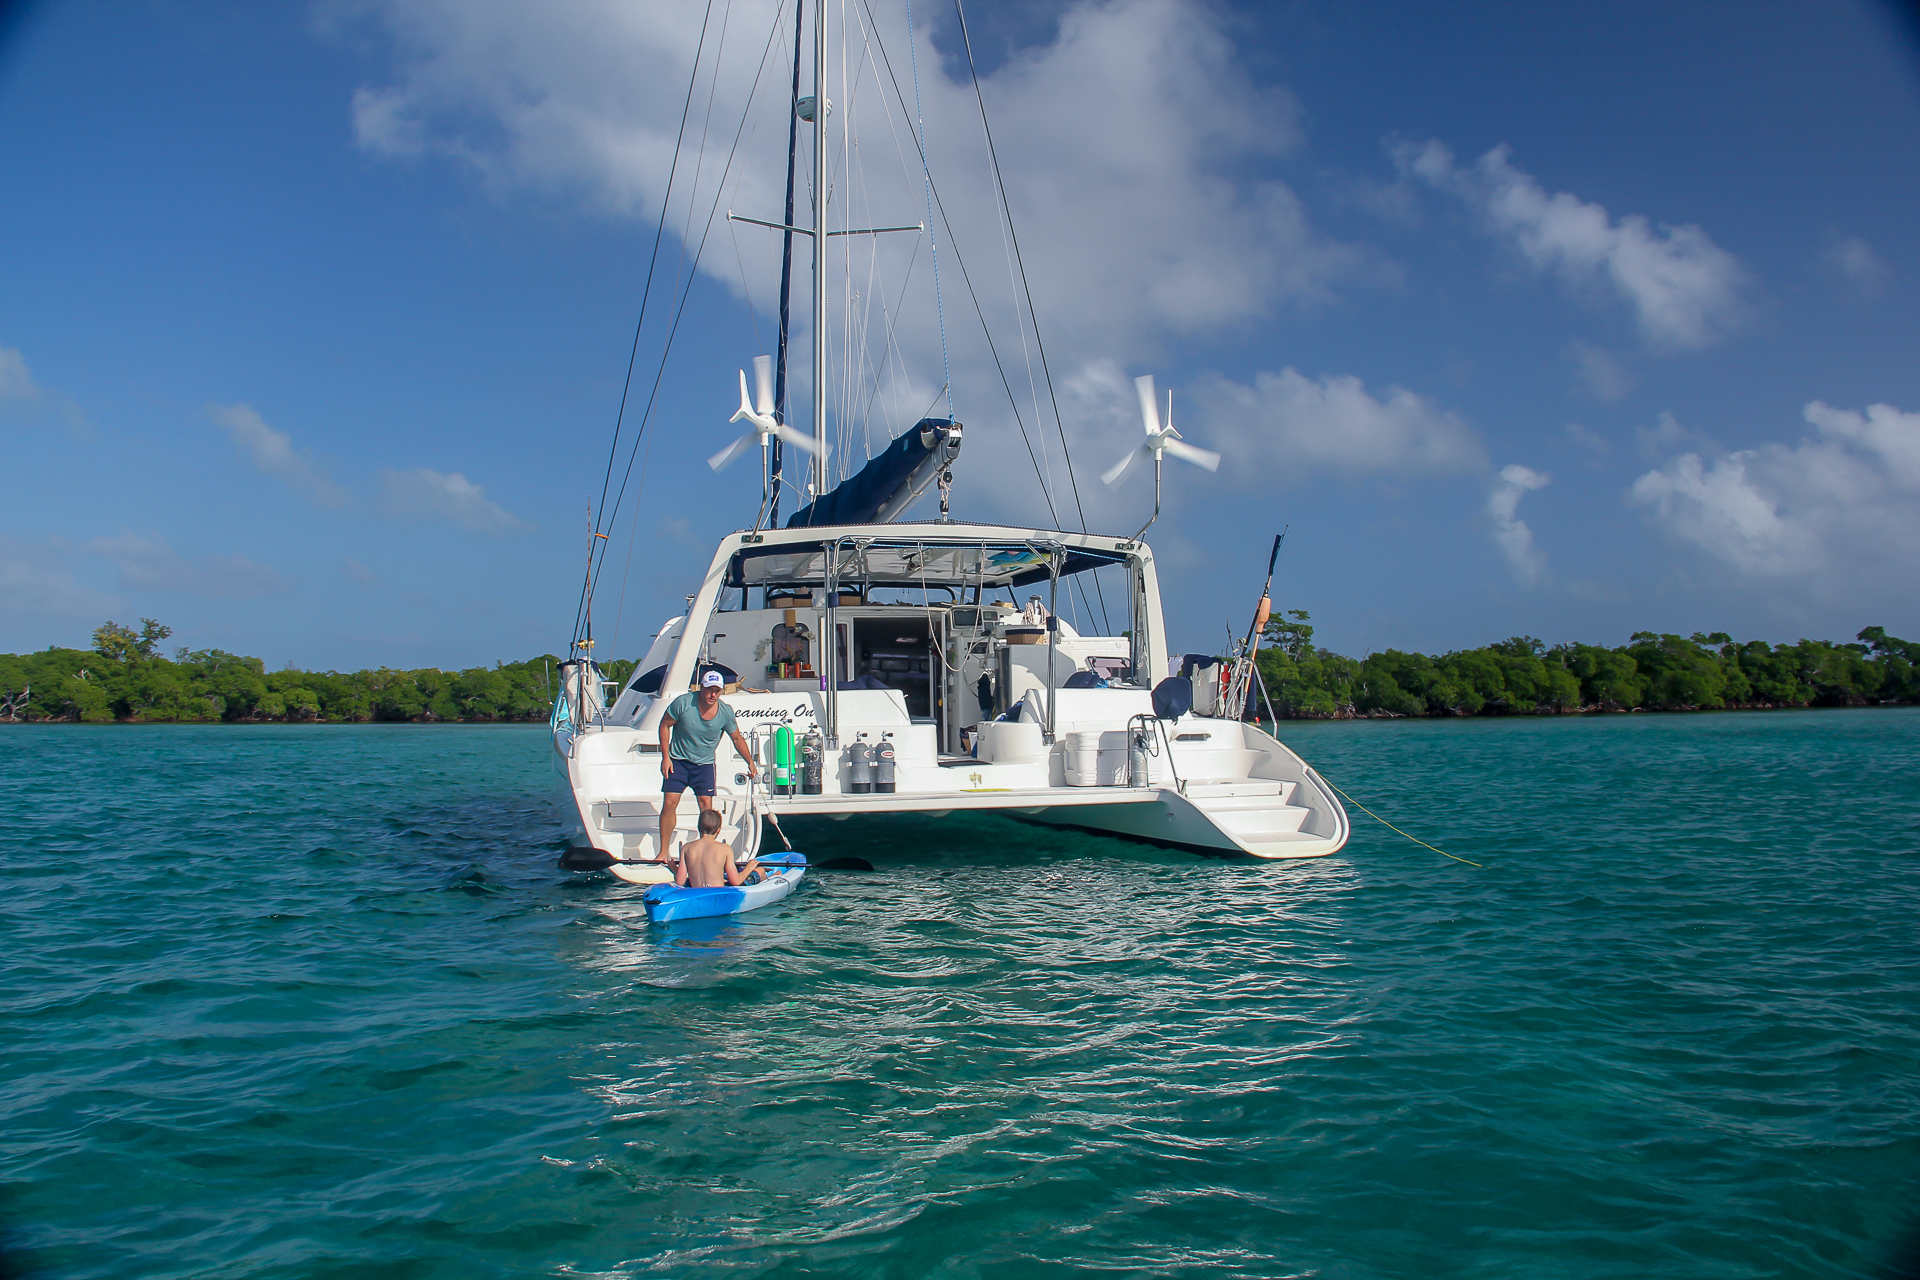 Dreaming on Catamaran